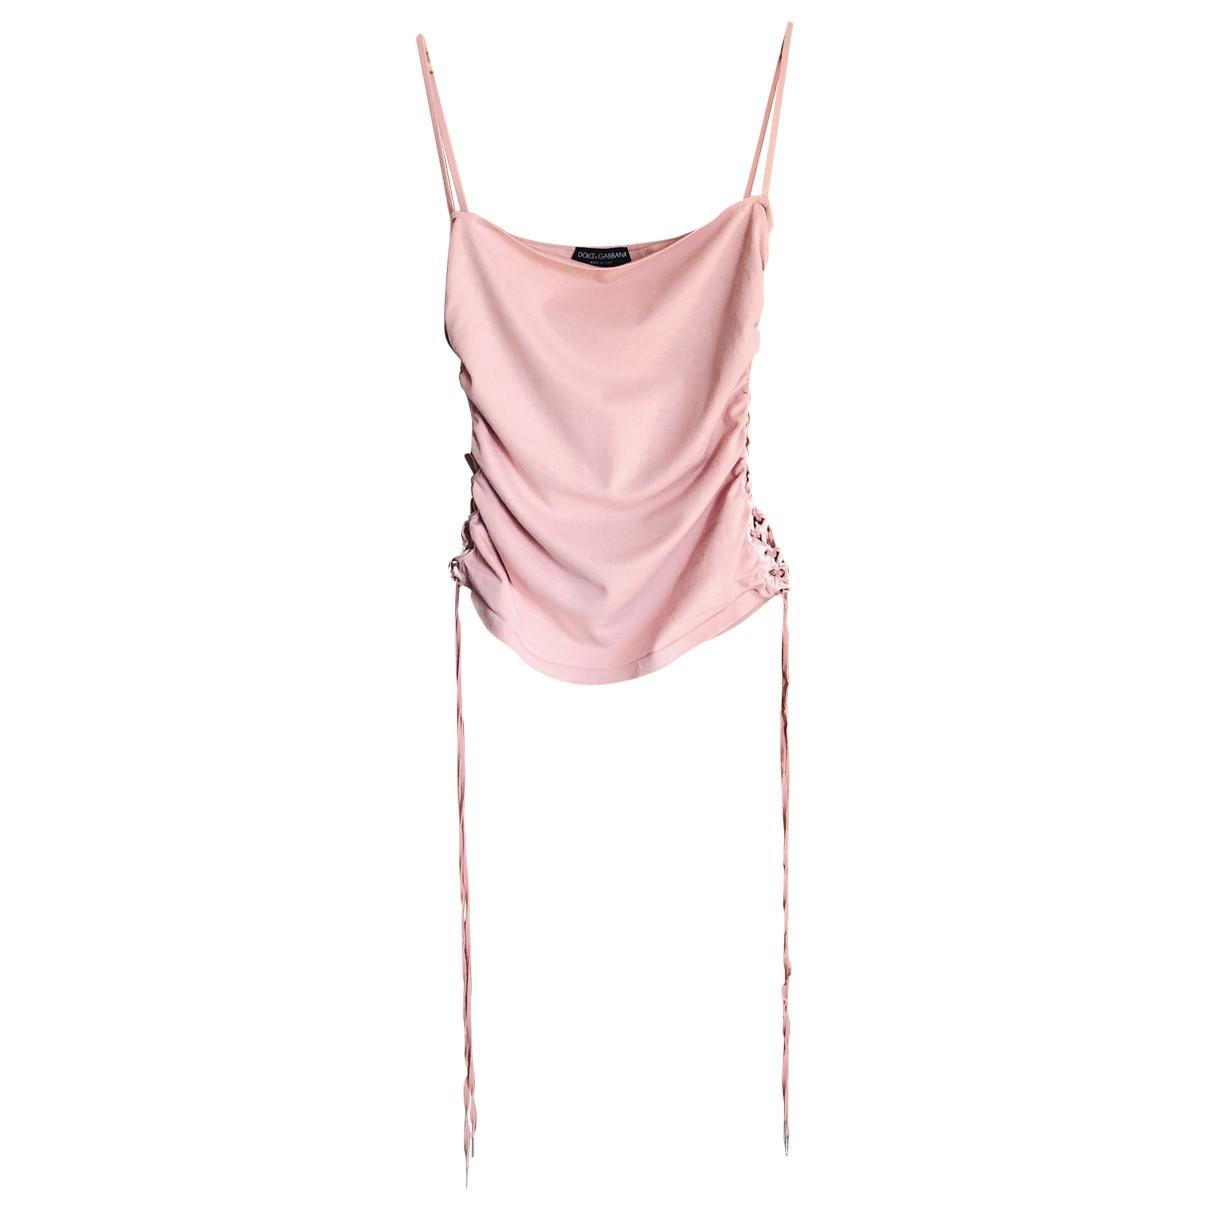 Dolce & Gabbana N Pink  top for Women M International